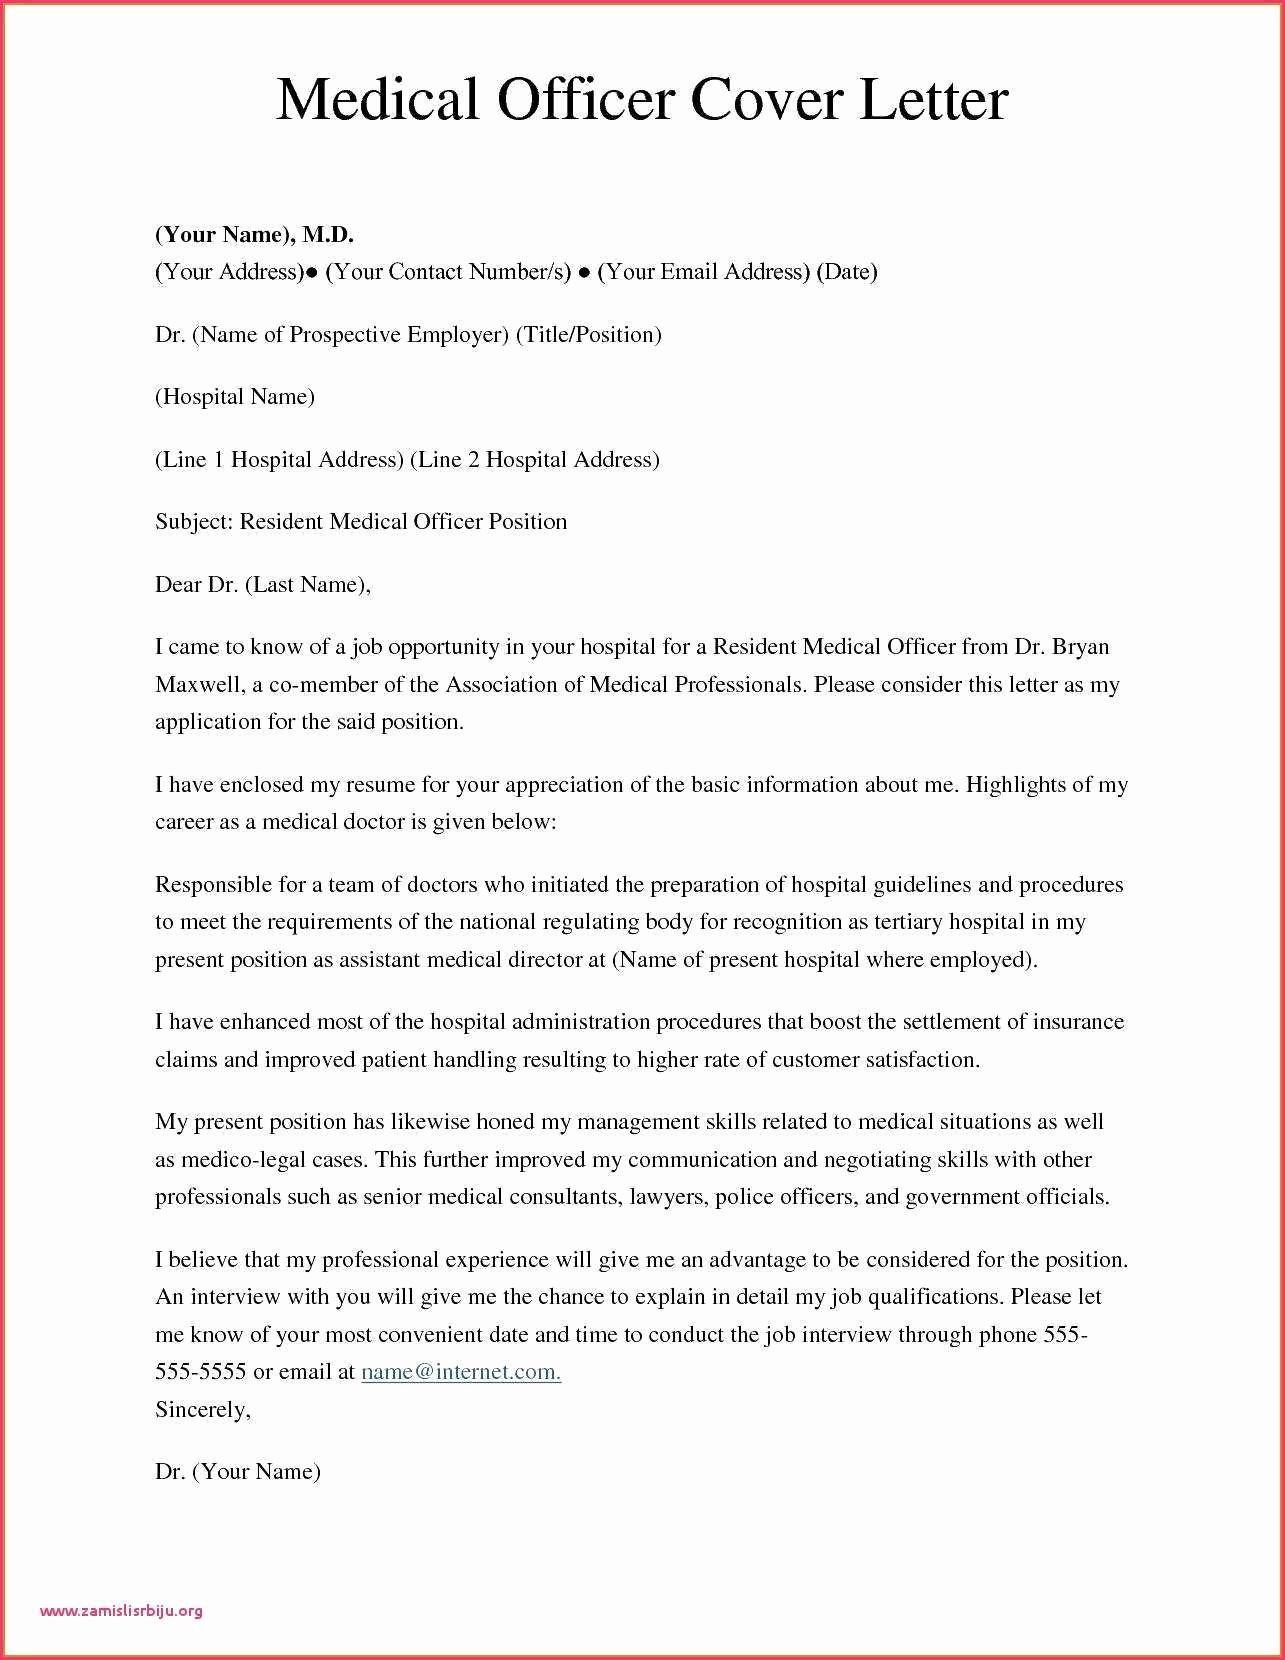 Sample Letter Of Explanation for Mortgage Refinance Fresh Sample Letter Explaining Bankruptcy for Mortgage Loan How